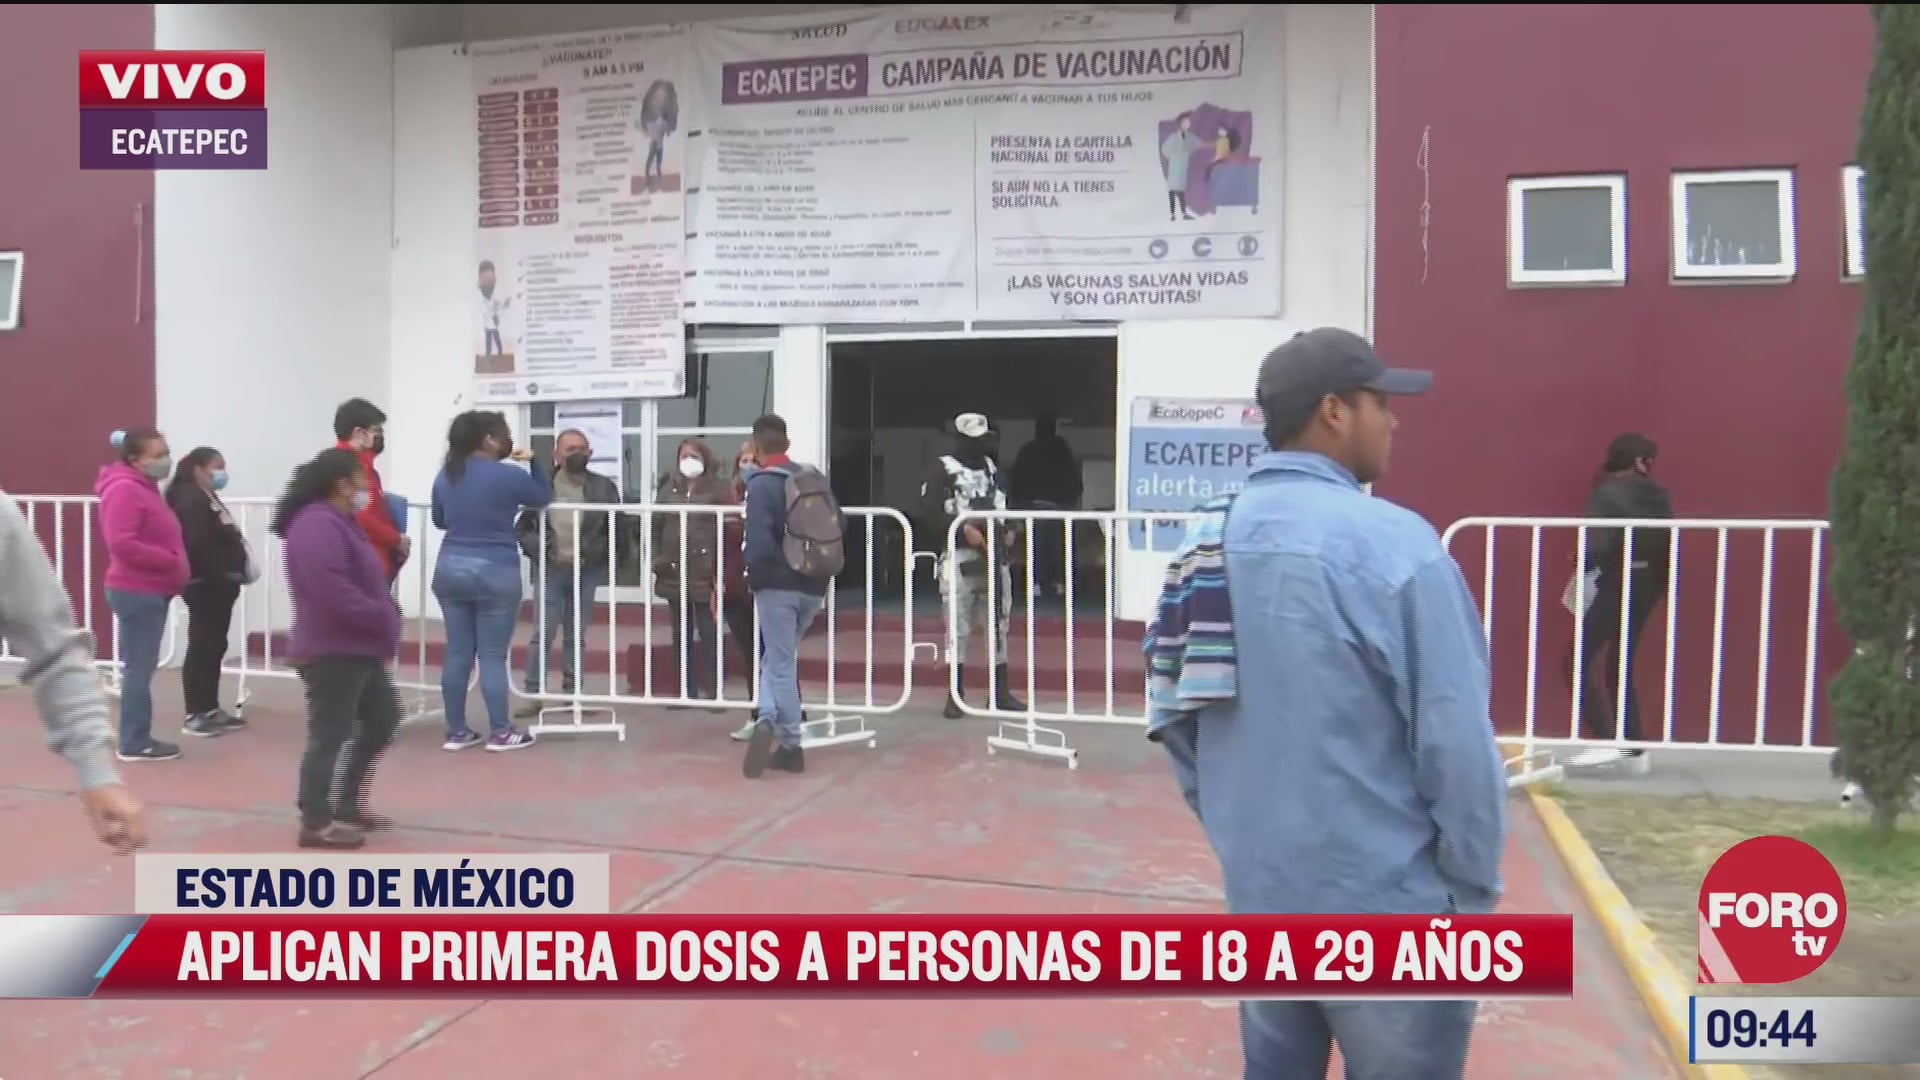 se aplica primera dosis a personas de 18 a 29 anos en ecatepec edomex